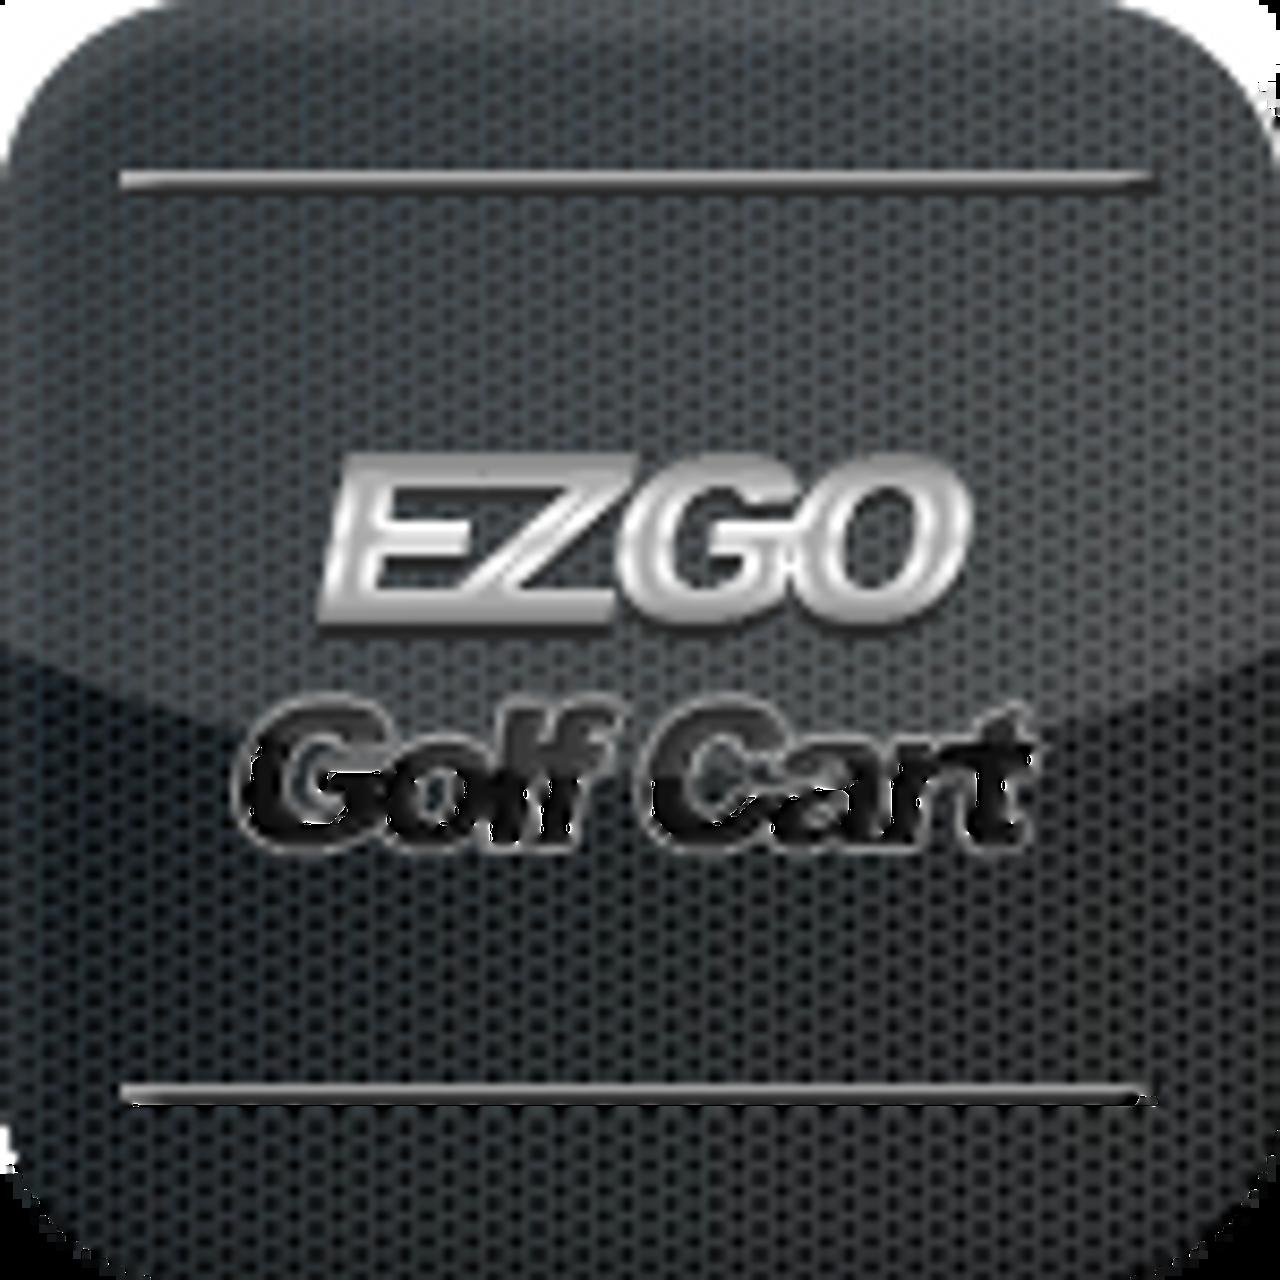 EZGO Golf Cart Bumpers